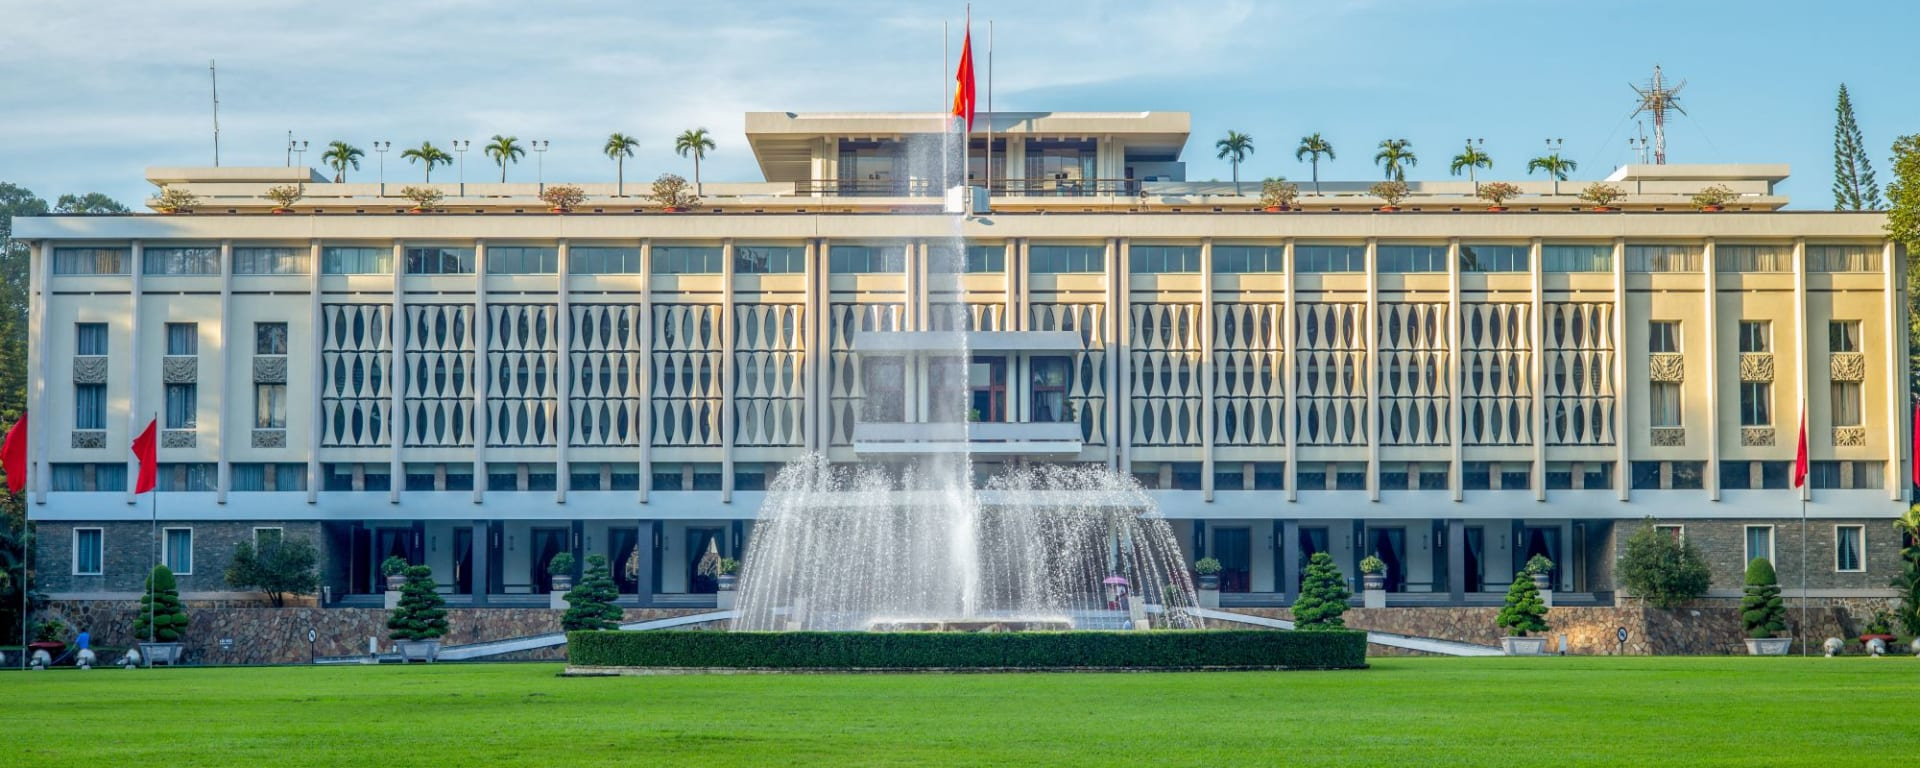 Saigon auf eigene Faust - ganzer Tag: Saigon Independence Palace